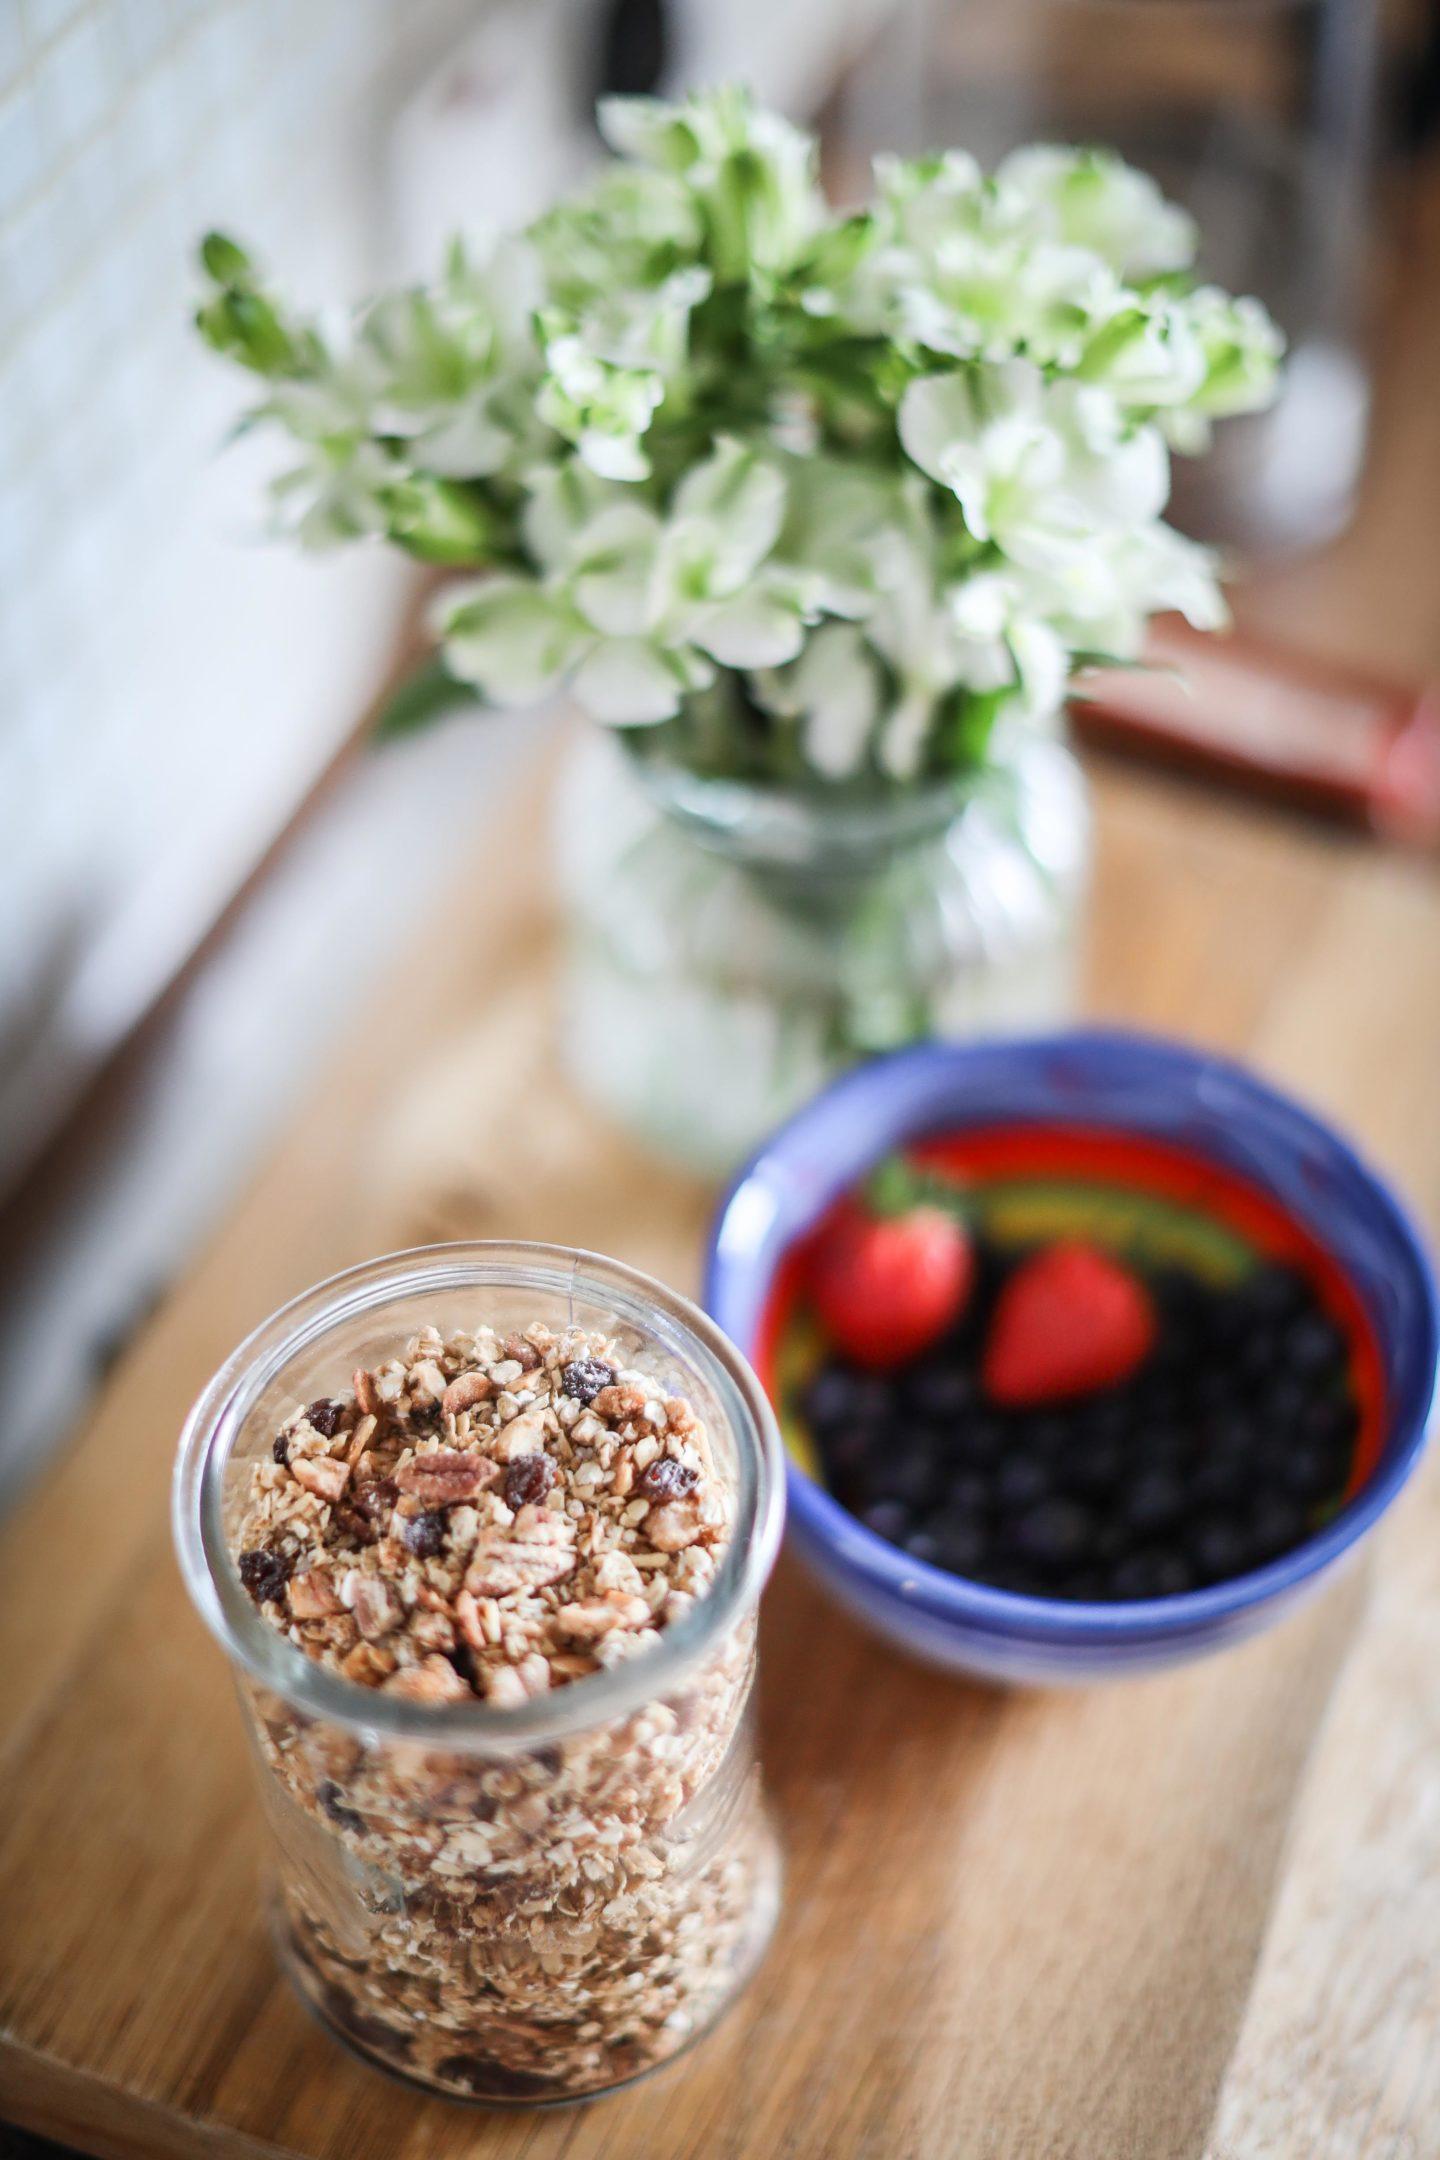 Homemade granola – The Daydreamer